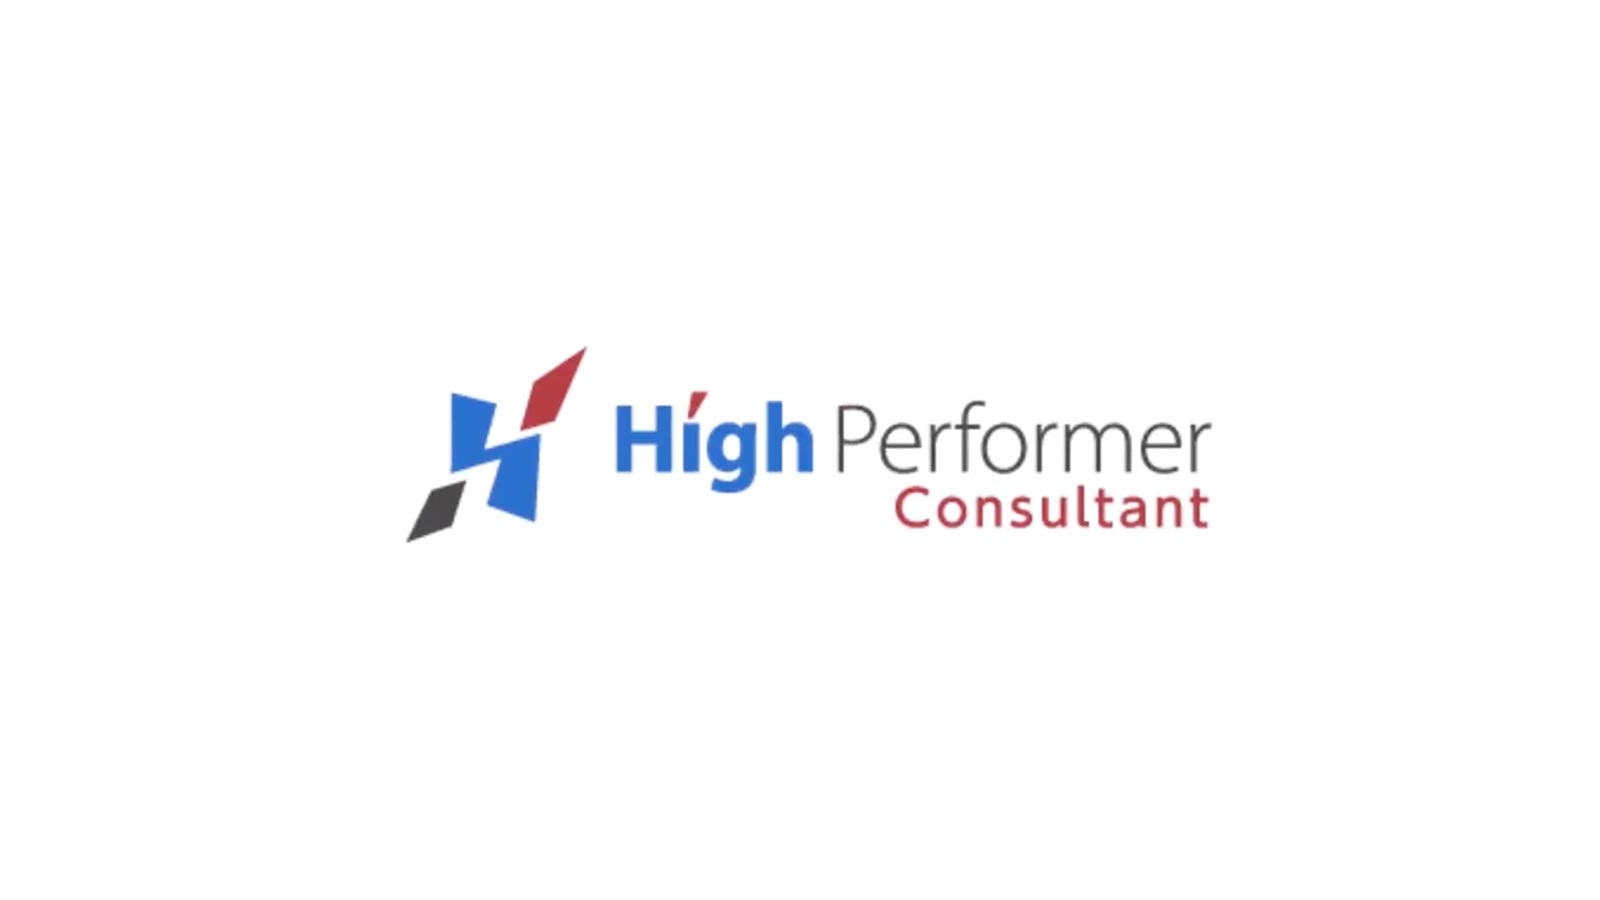 High-Performerコンサルタント